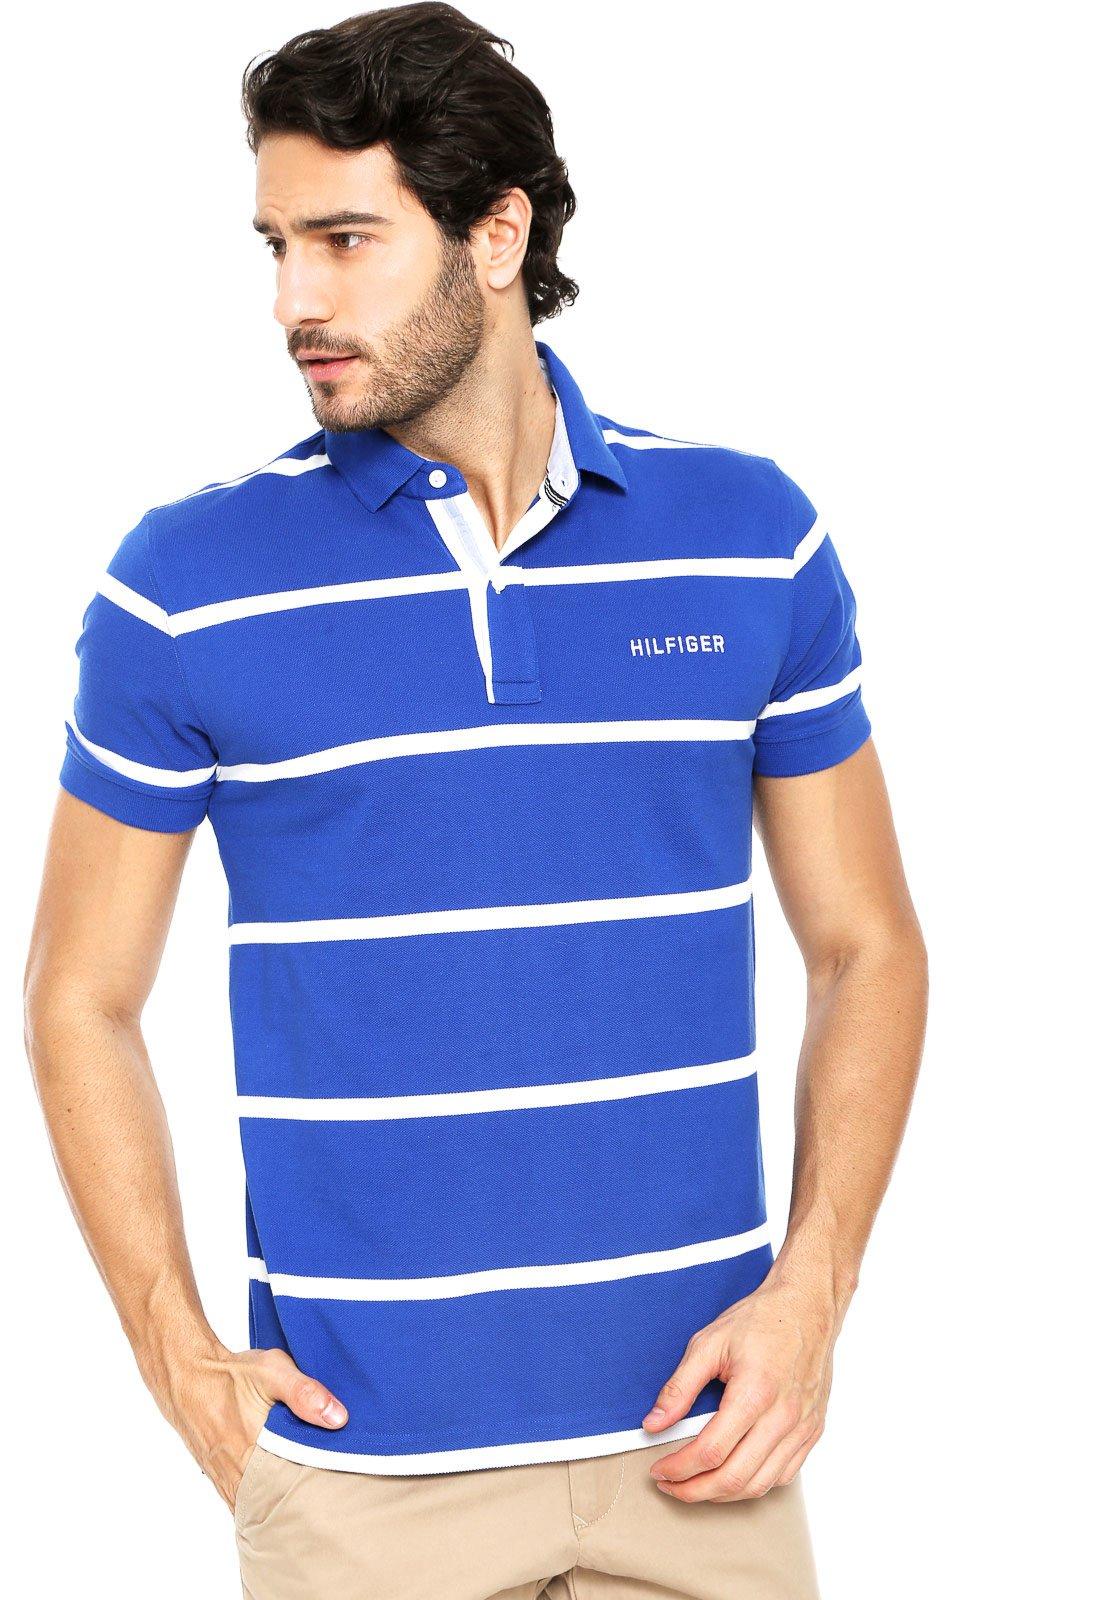 83fd5d8435 Camisa Polo Tommy Hilfiger Listras Azul - Compre Agora